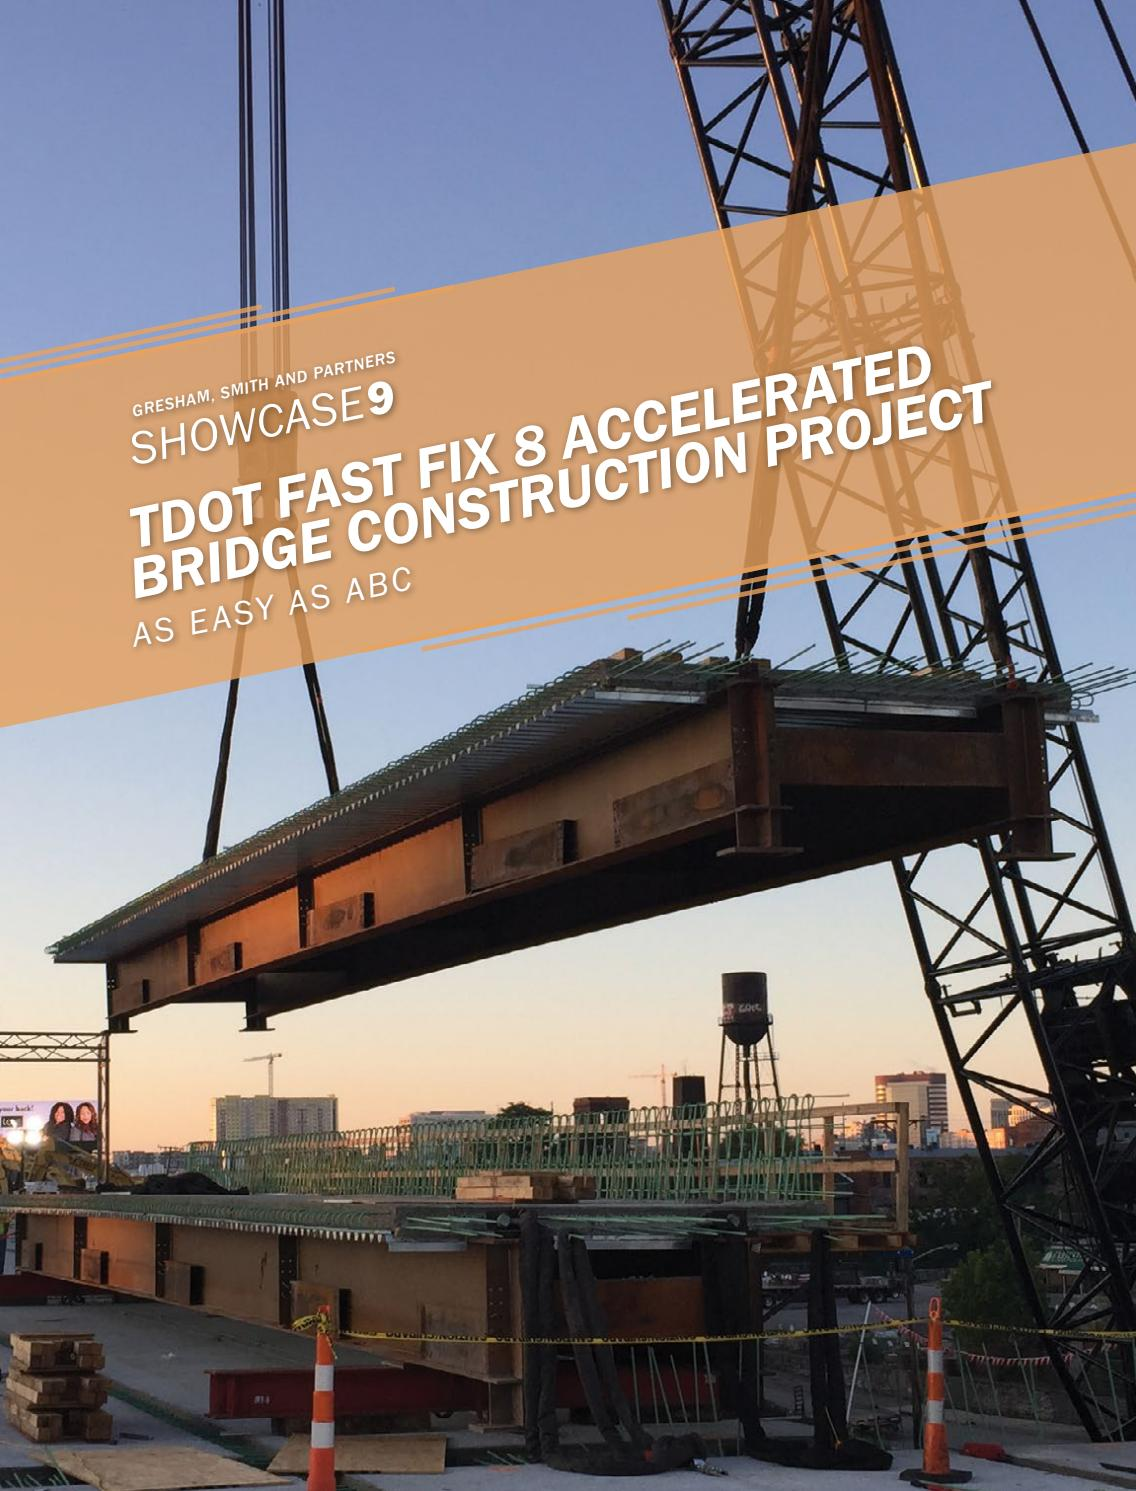 Showcase 9 - TDOT Fast Fix 8 Accelerated Bridge Construction